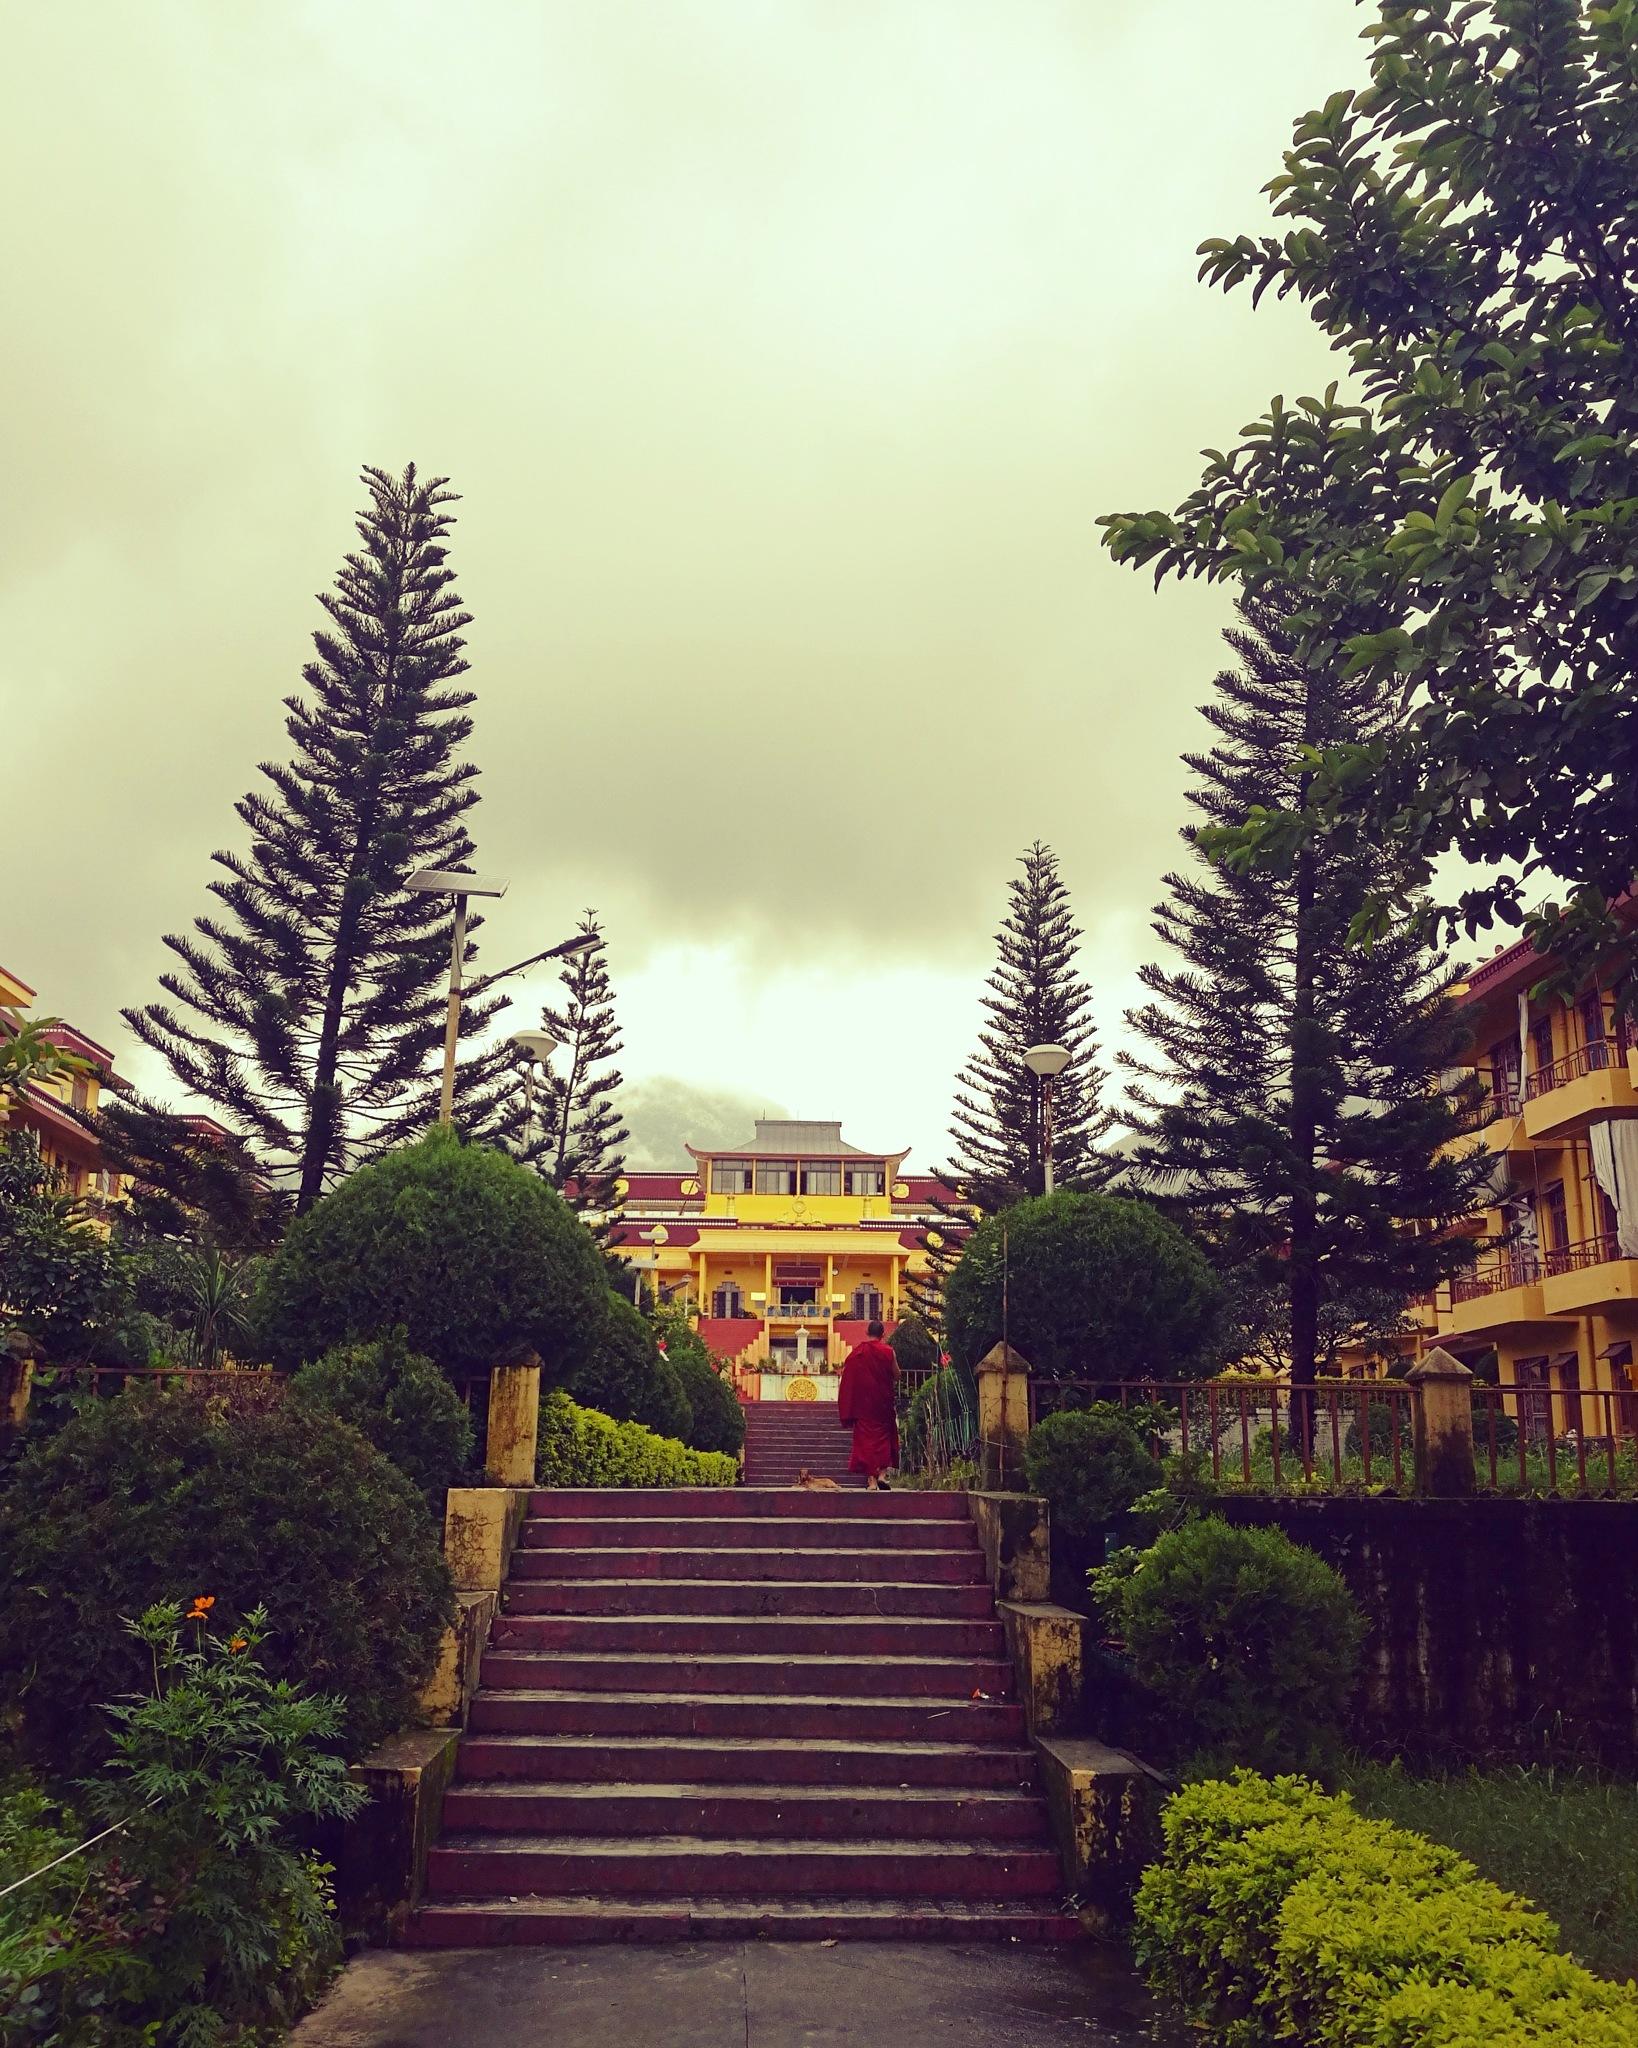 Peace by Shubhanjali Bisht